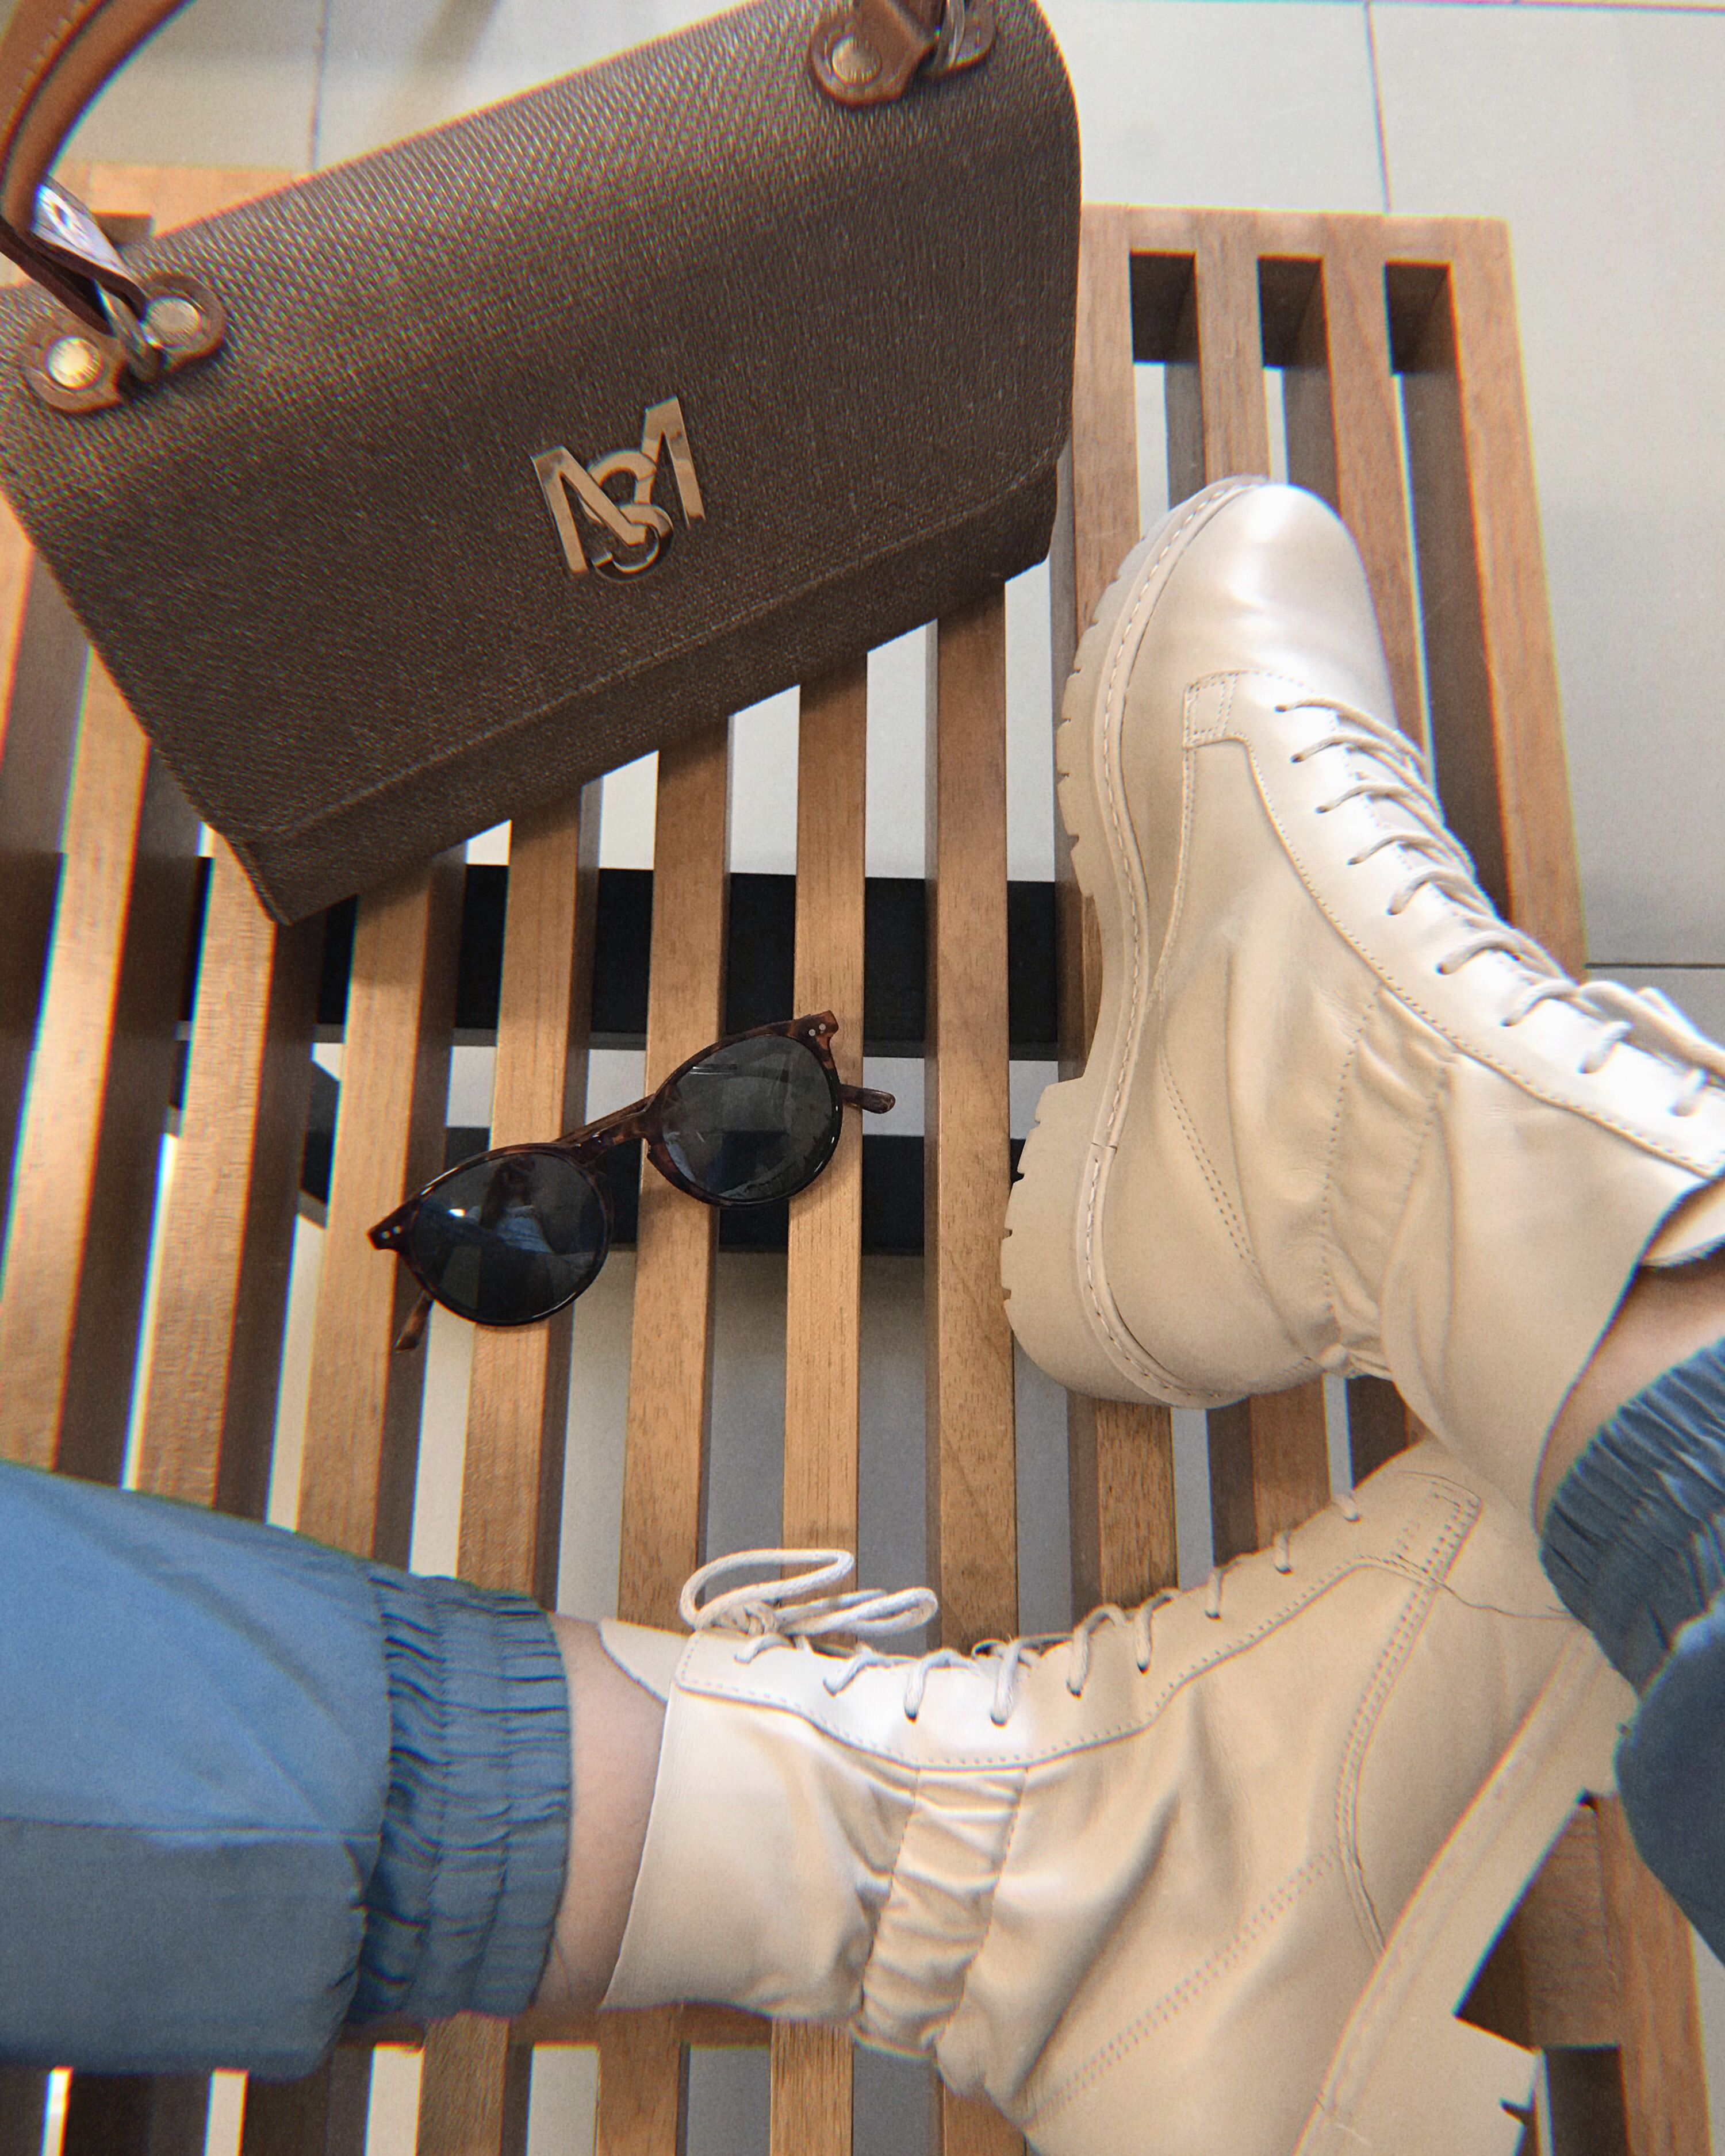 Paixão por aquele corturno lindo 💕  . . . . #lookdodia #lookdetrabalhododia #fashionworld #coturnooffwhite  #producaodemoda #consultoriadeestilo #fashionblogger #fashioninspiration #inspiraçãododia #lookinspiracao